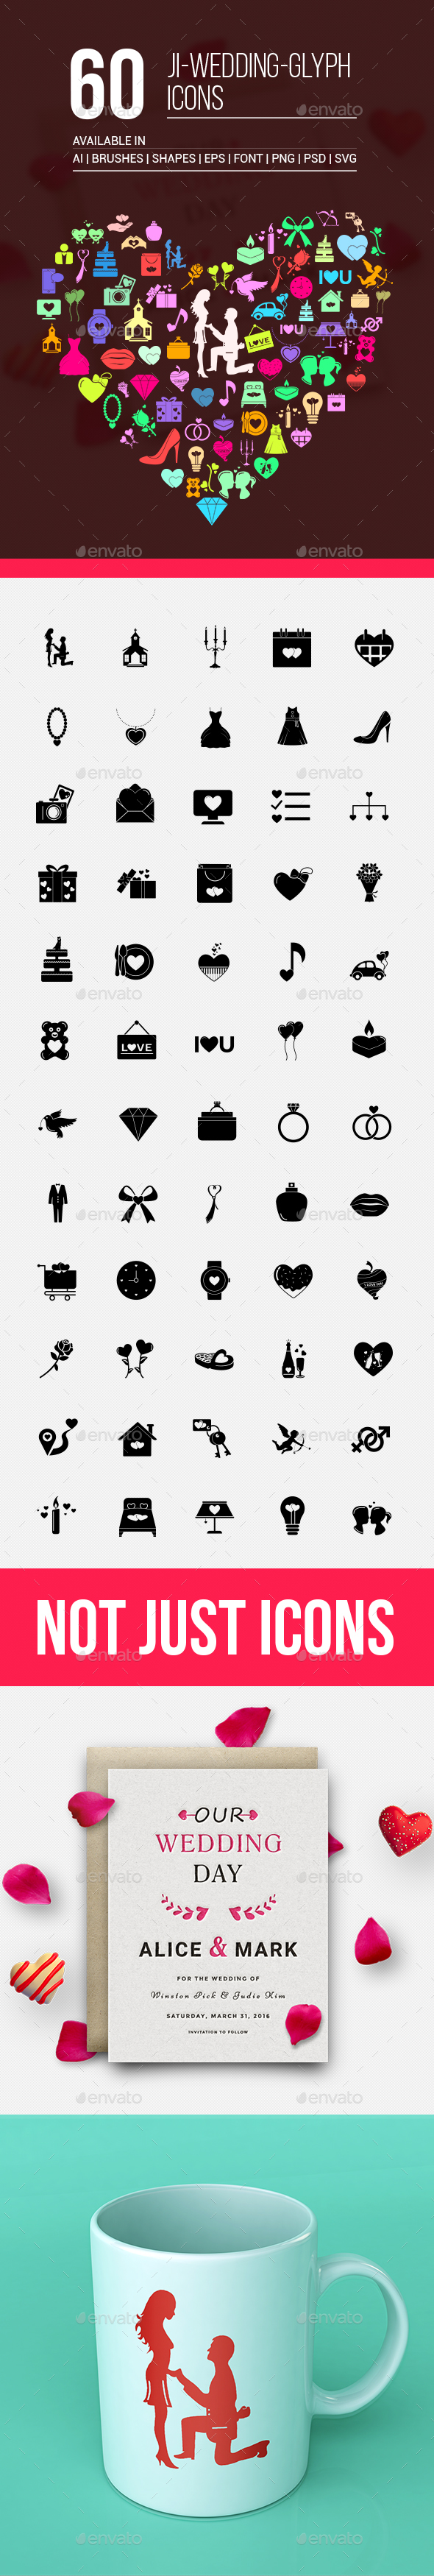 JI-Wedding (60 Icons) - Seasonal Icons